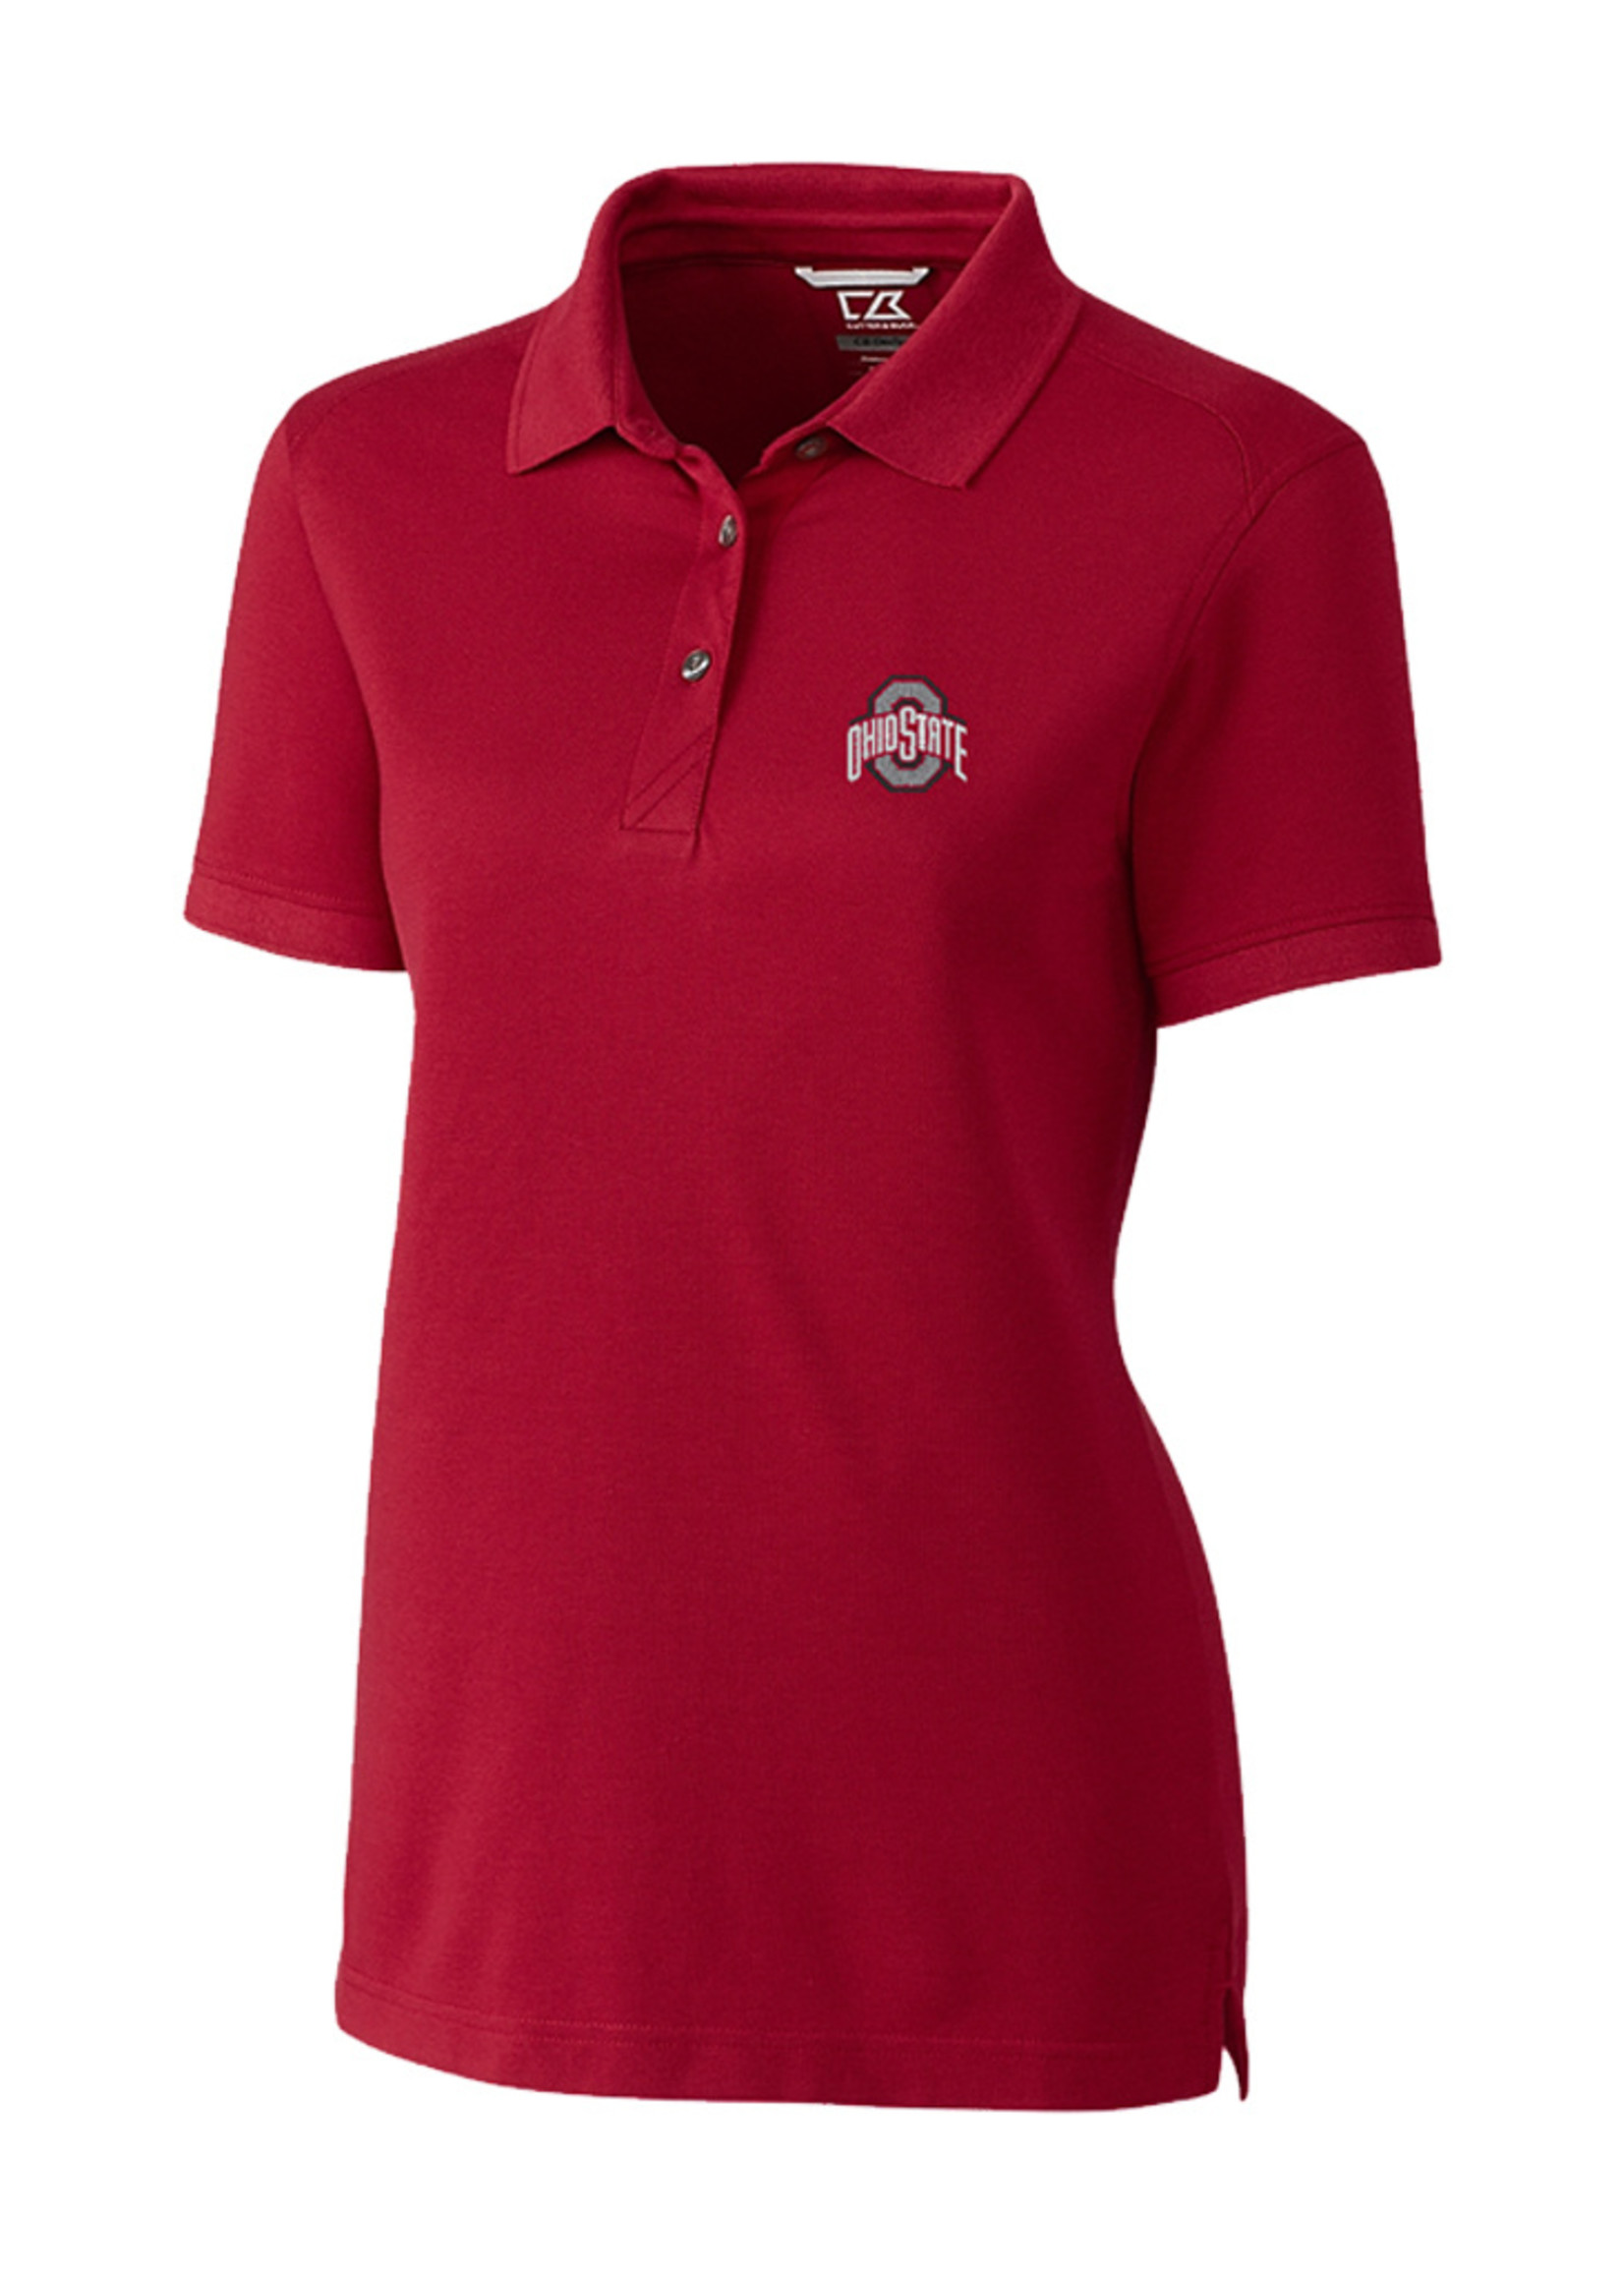 Cutter & Buck Ohio State University Women's Cotton Advantage Polo